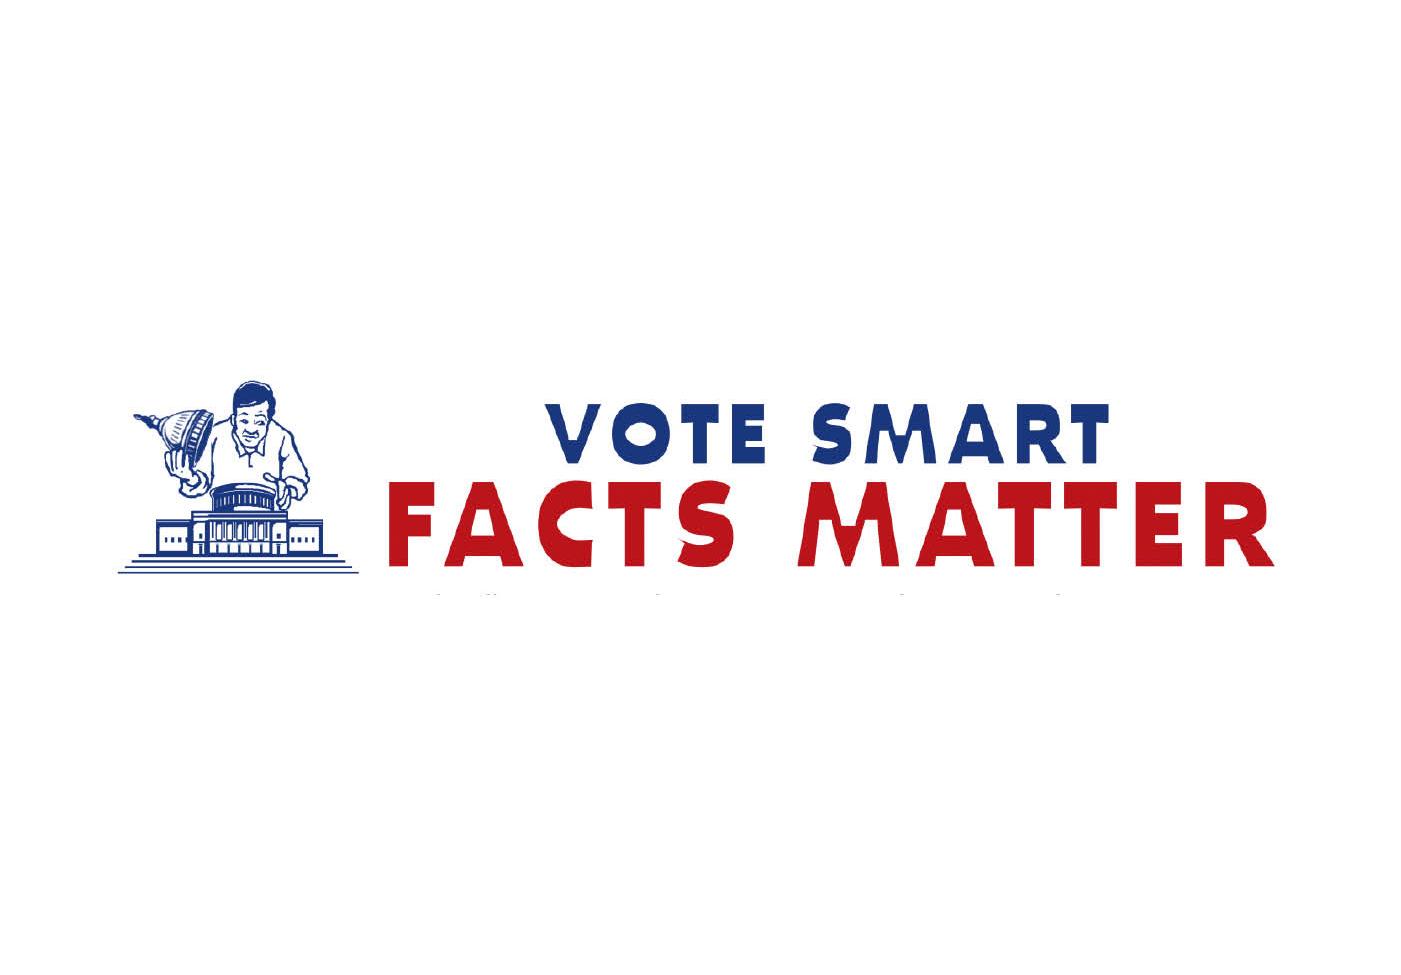 Vote Smart Facts Matter logo